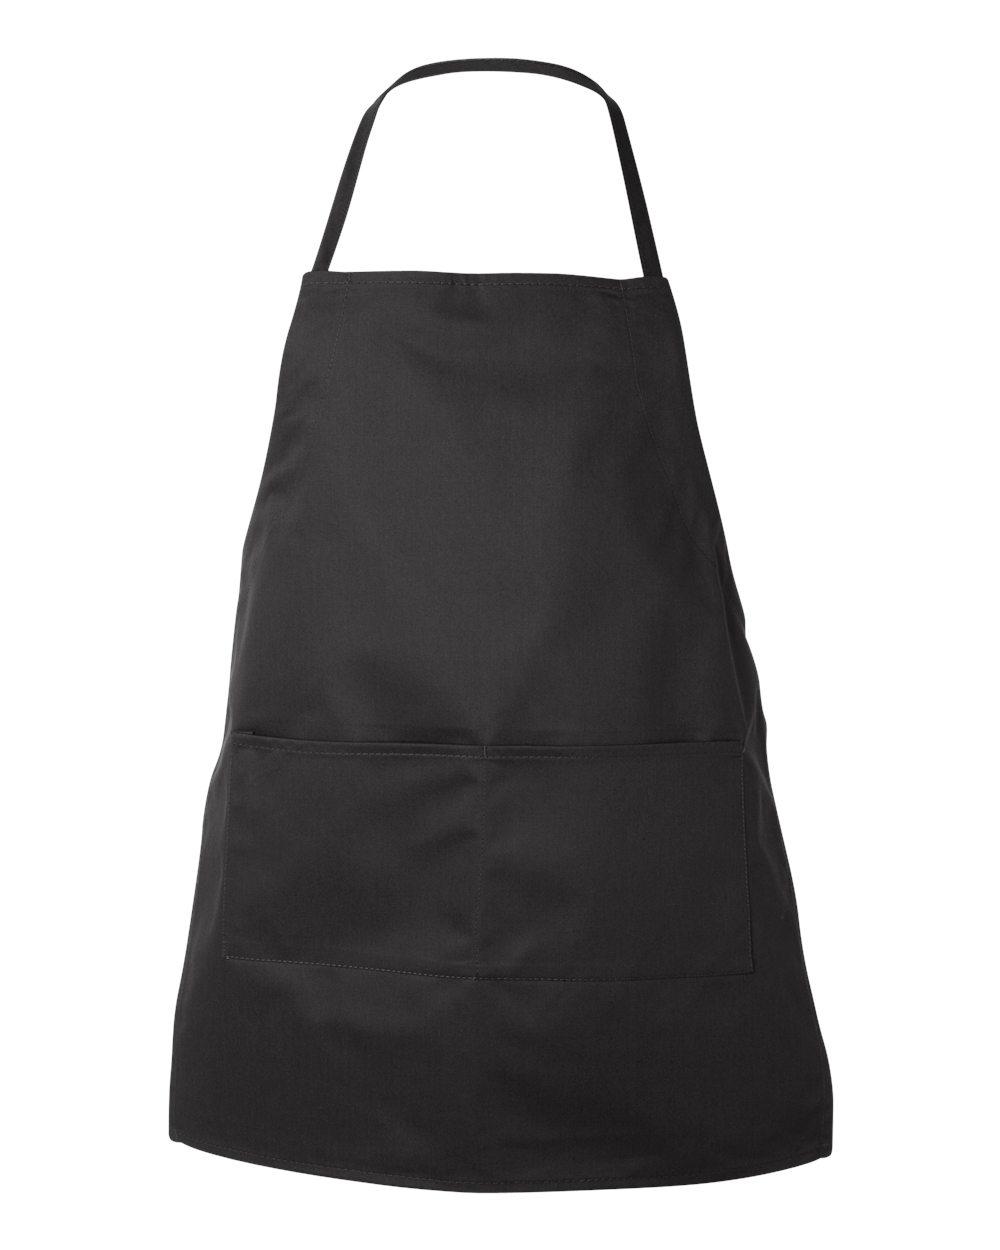 Liberty Bags 5502